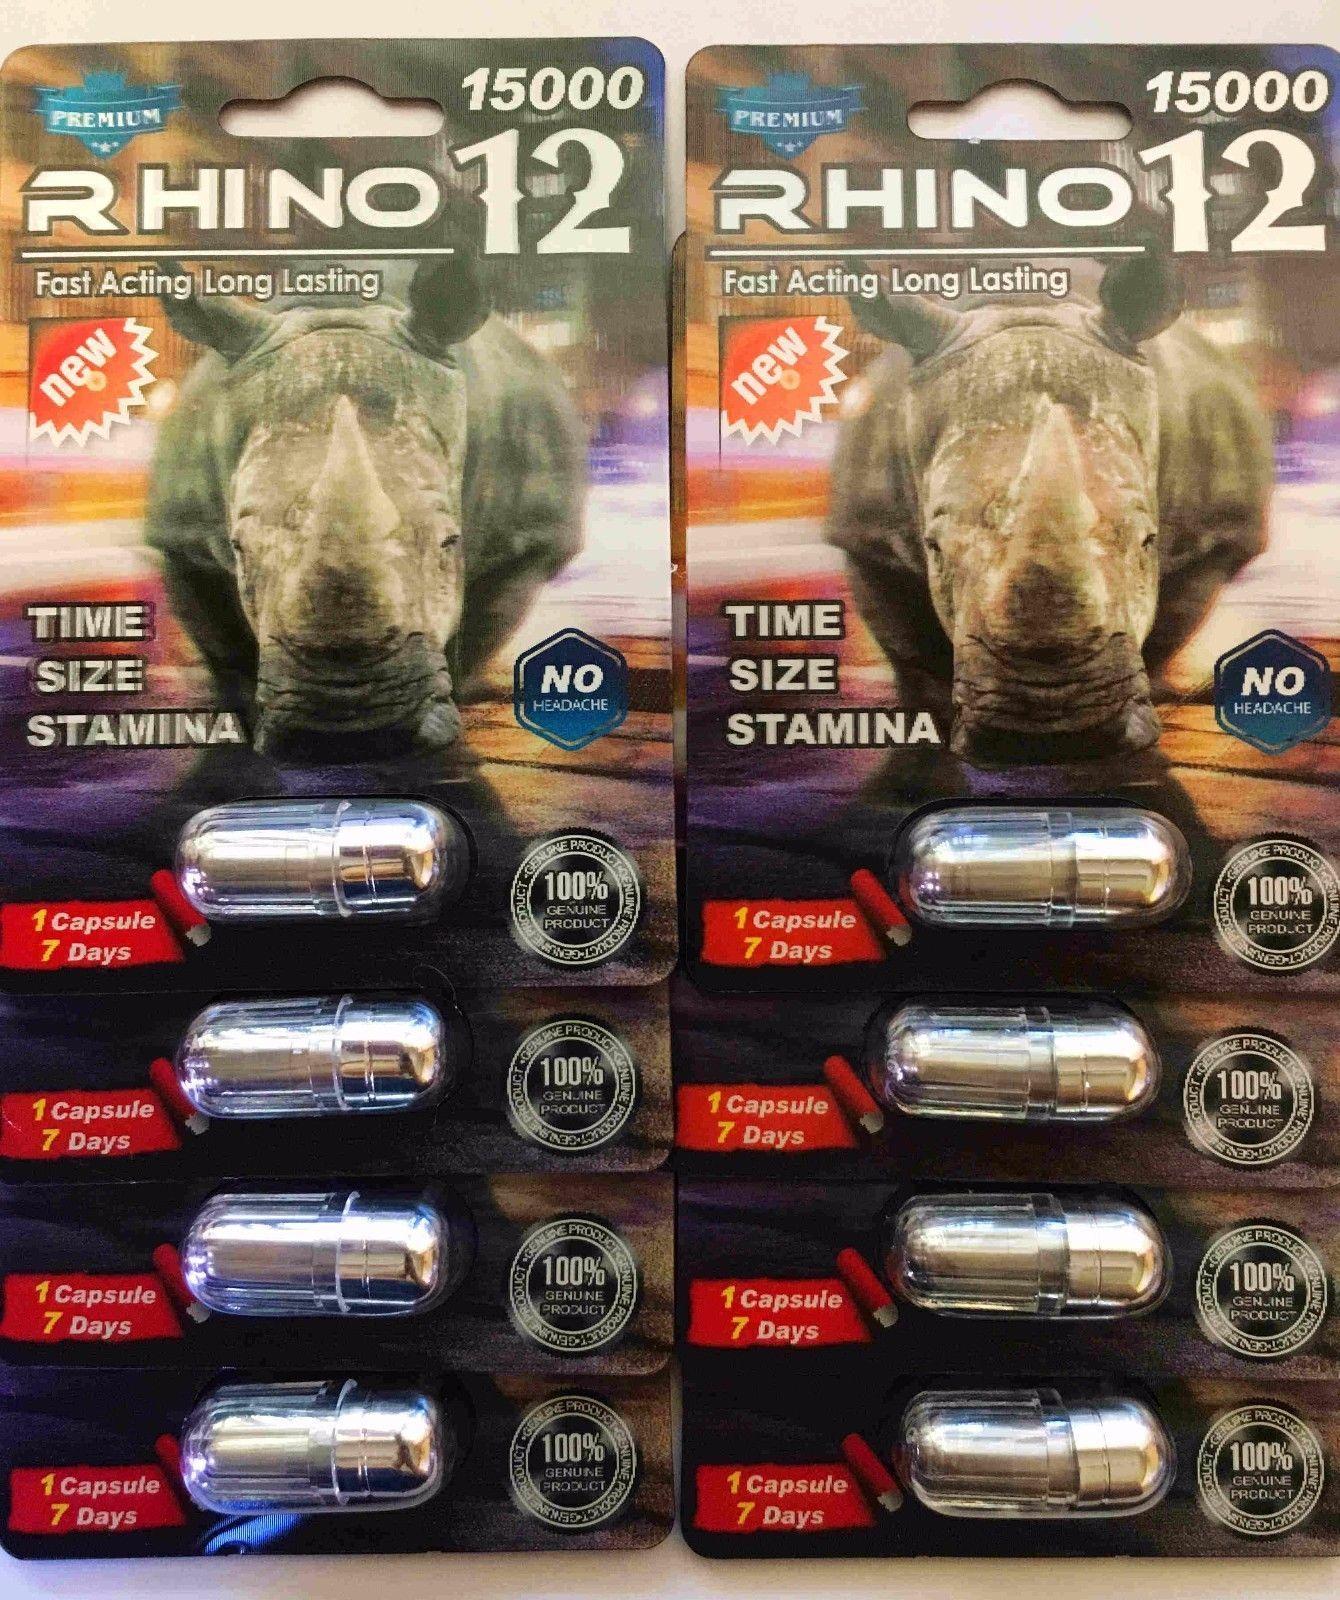 100% Genuine Rhino 12 Premium 15000 Male Sexual Performance Enhancer image 7